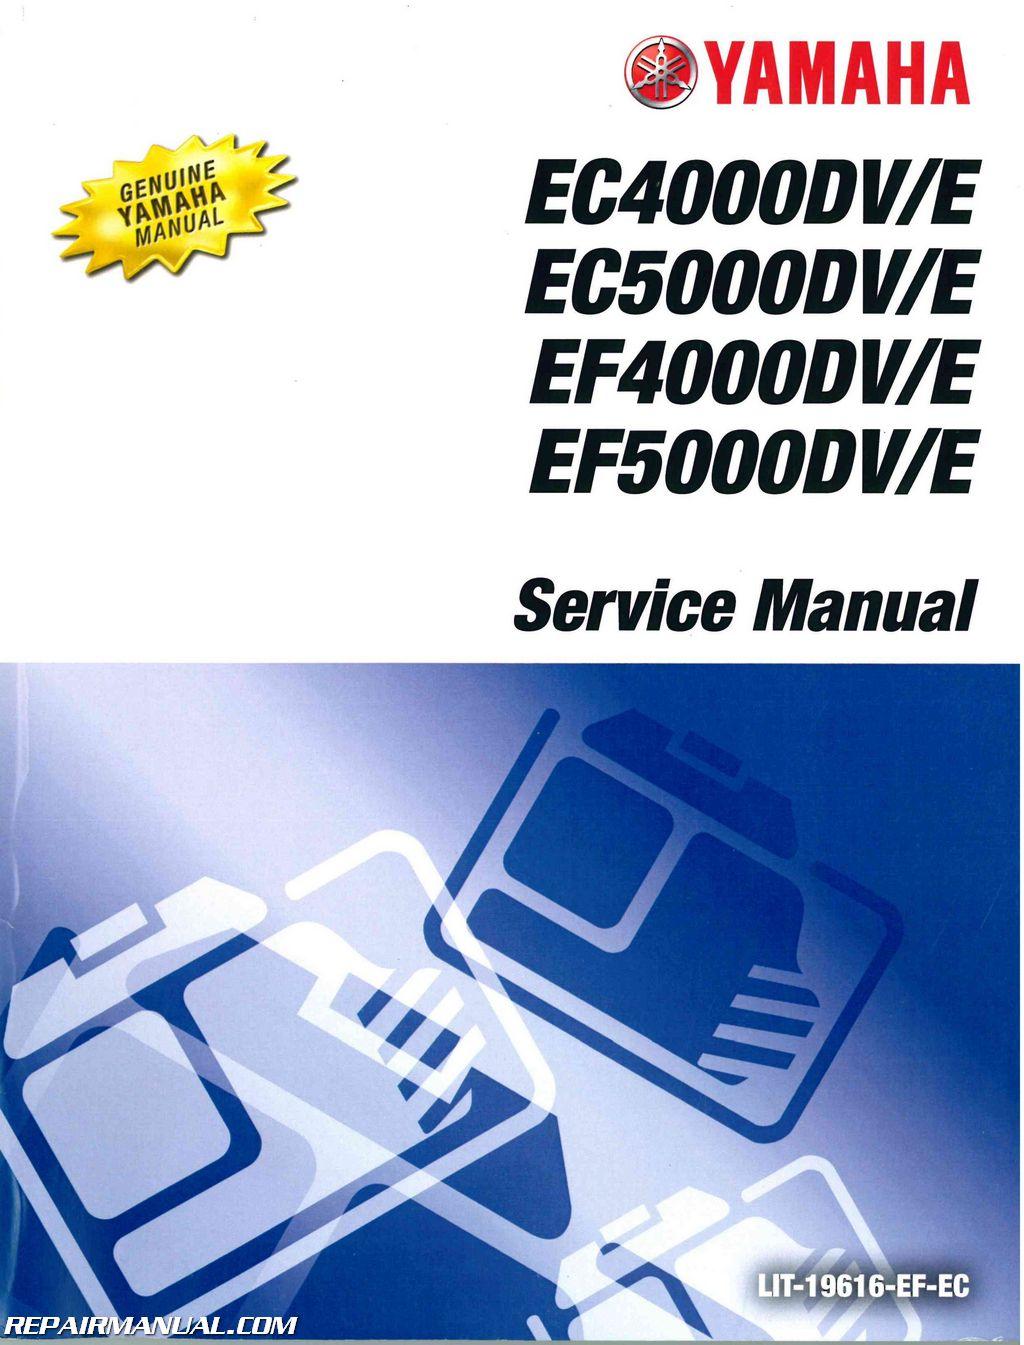 yamaha ec ef 4000dv e ec ef 5000dv e generator service manual rh repairmanual com yamaha generator manuals online yamaha generator manual download 4500 ise